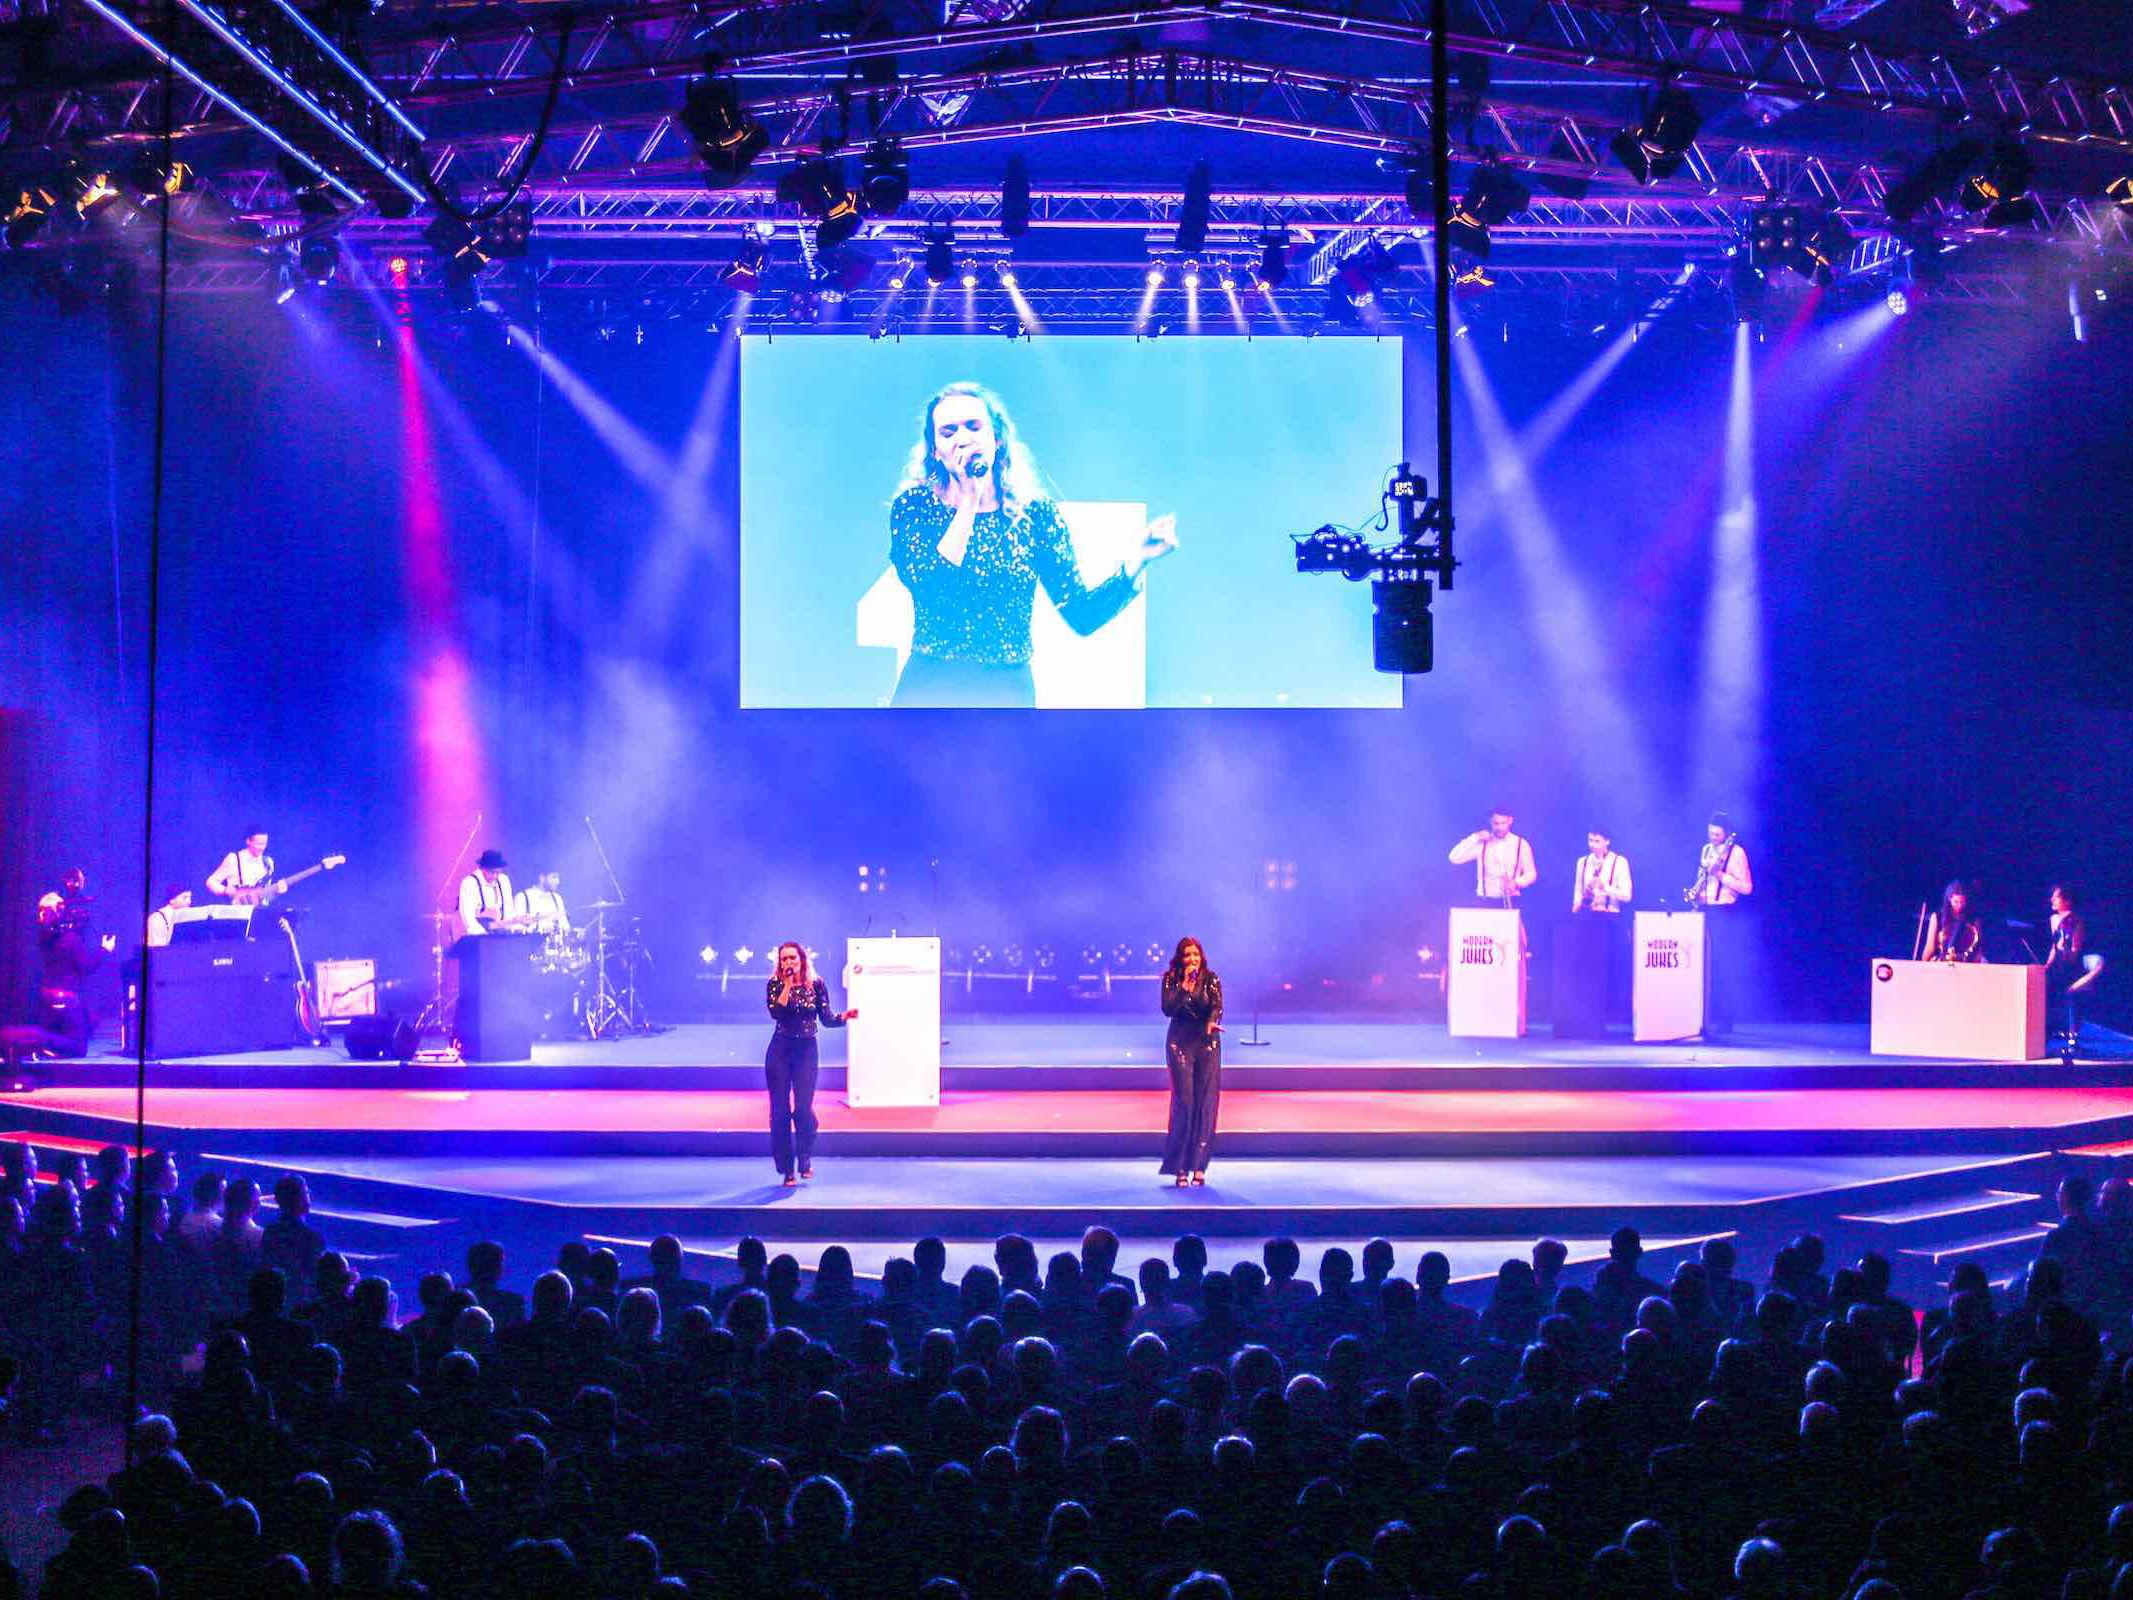 Eventplanung   Hannover   Eventdesign   Eventausstatung   Kongresse   Shows   Galas   Modenschauen   Produktpräsentationen   Bühnenbau   Lichttechnik   LCD   Leinwand   Tontechnik   Logistik   Künstler